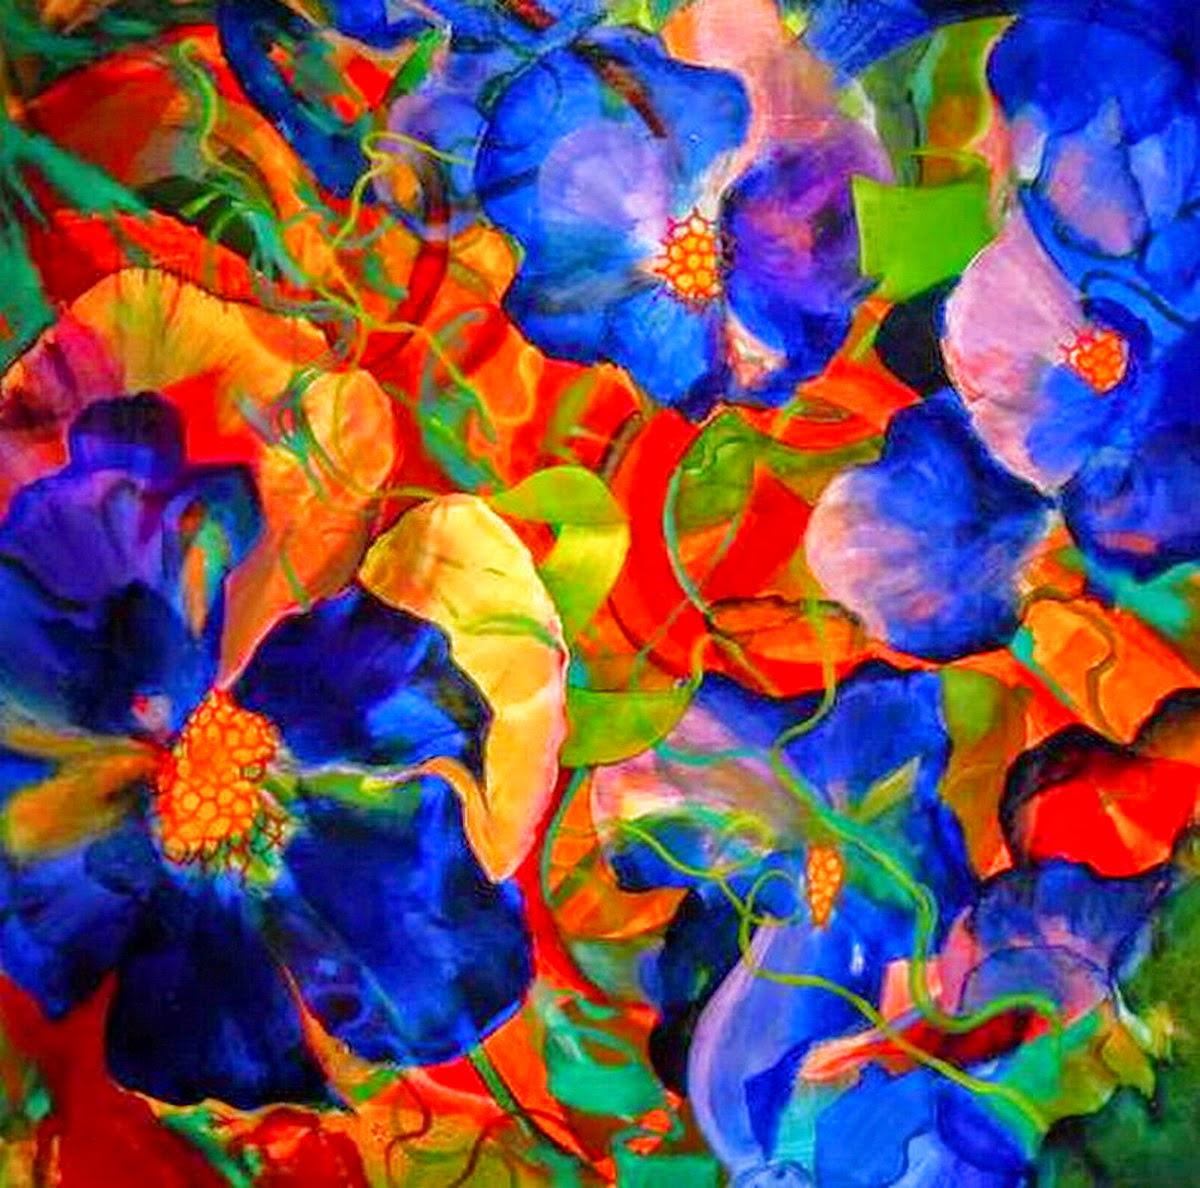 flores-modernas-grandes-pintadas